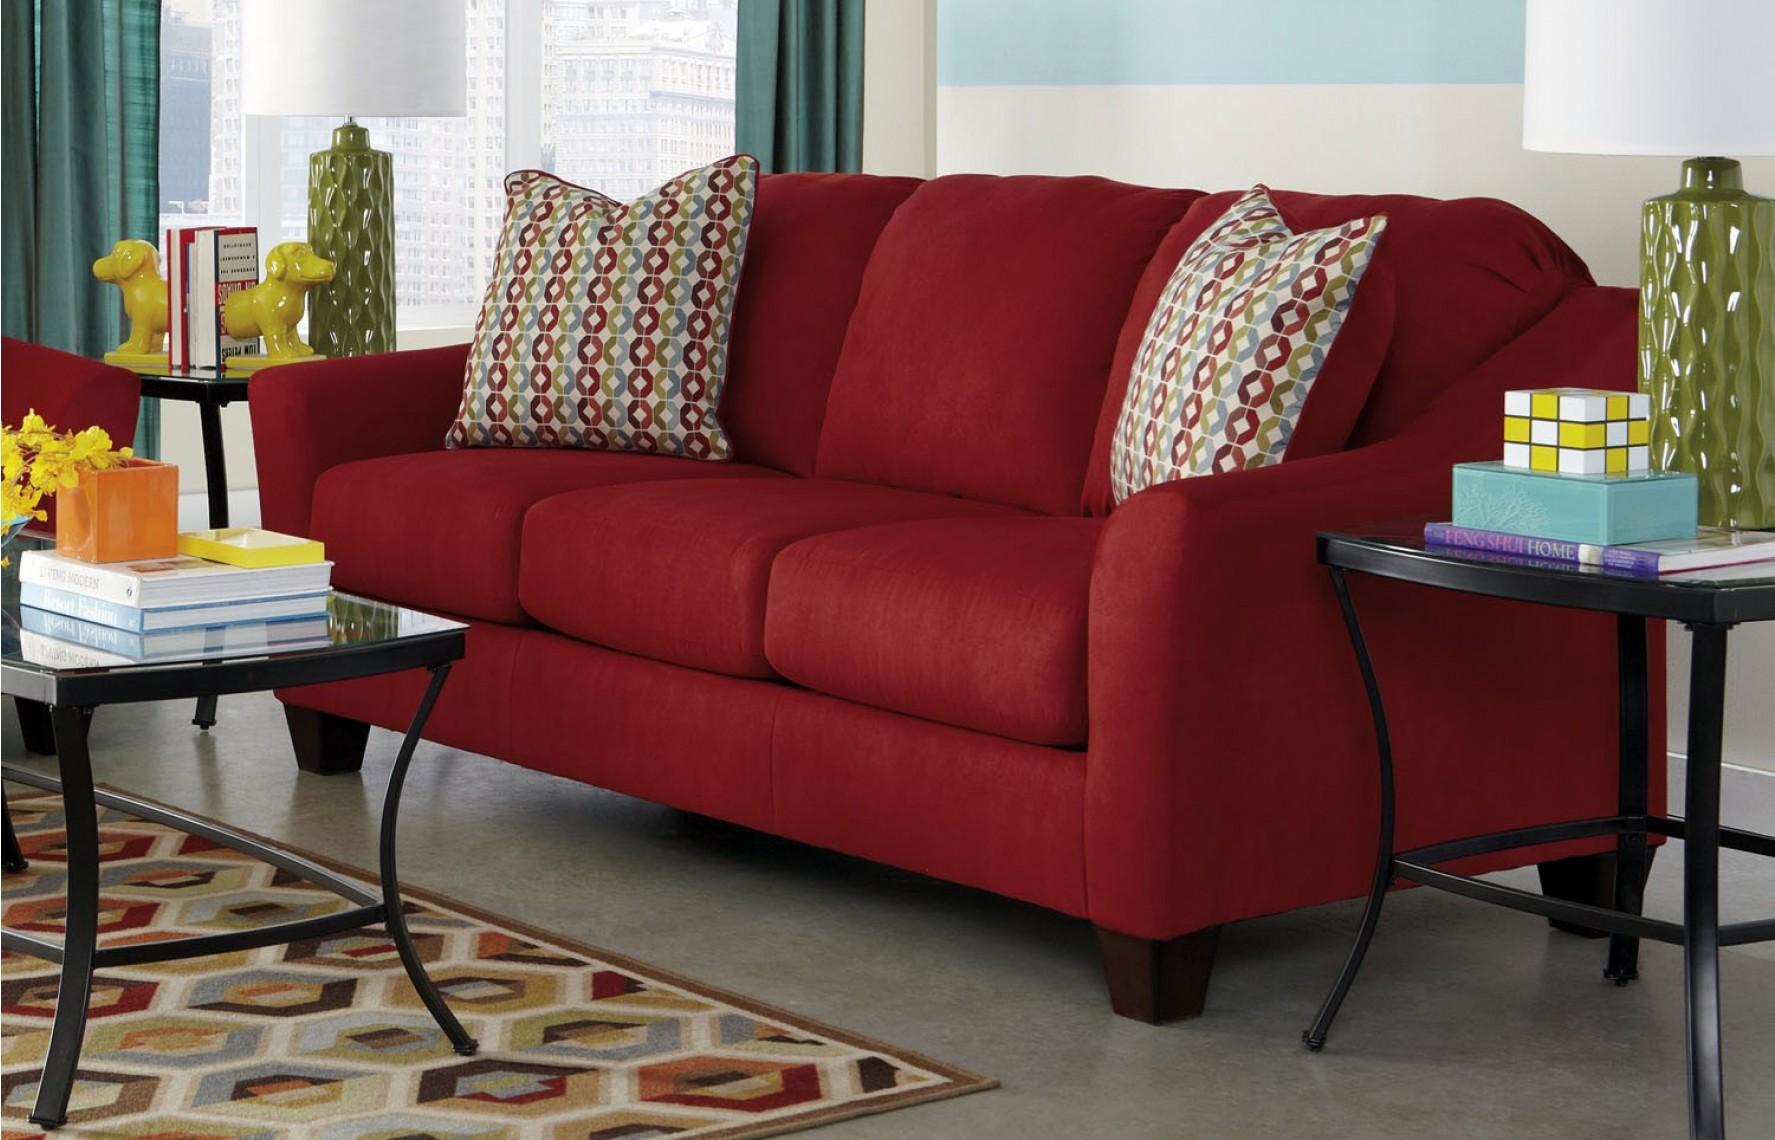 Empire Furniture Rental image 7